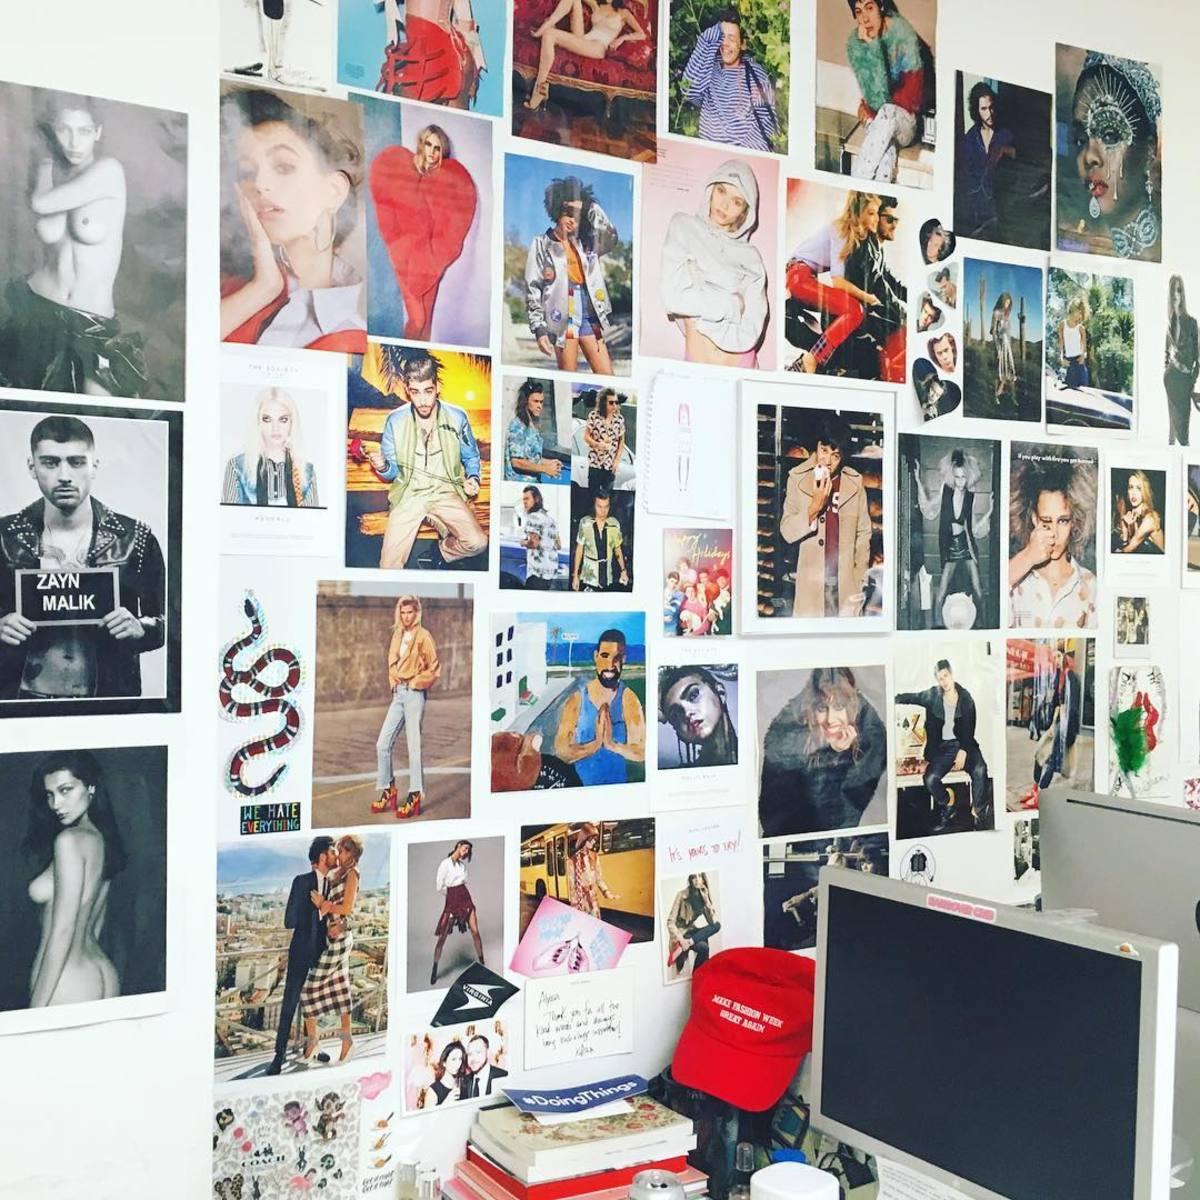 A peek inside the Fashionista office.